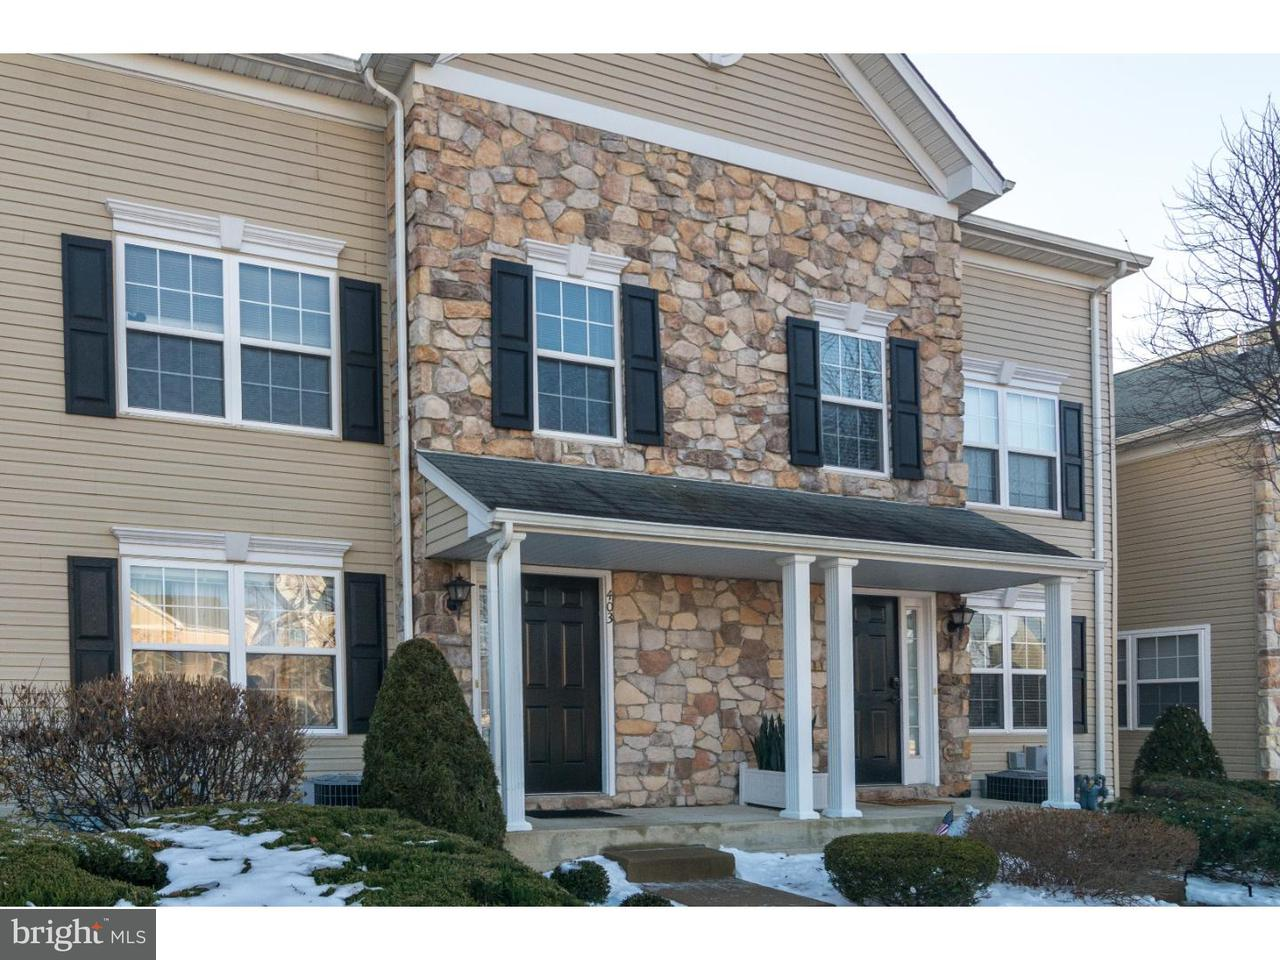 Single Family Home for Rent at 403 FELDSPAR CT #59 Warrington, Pennsylvania 18976 United States